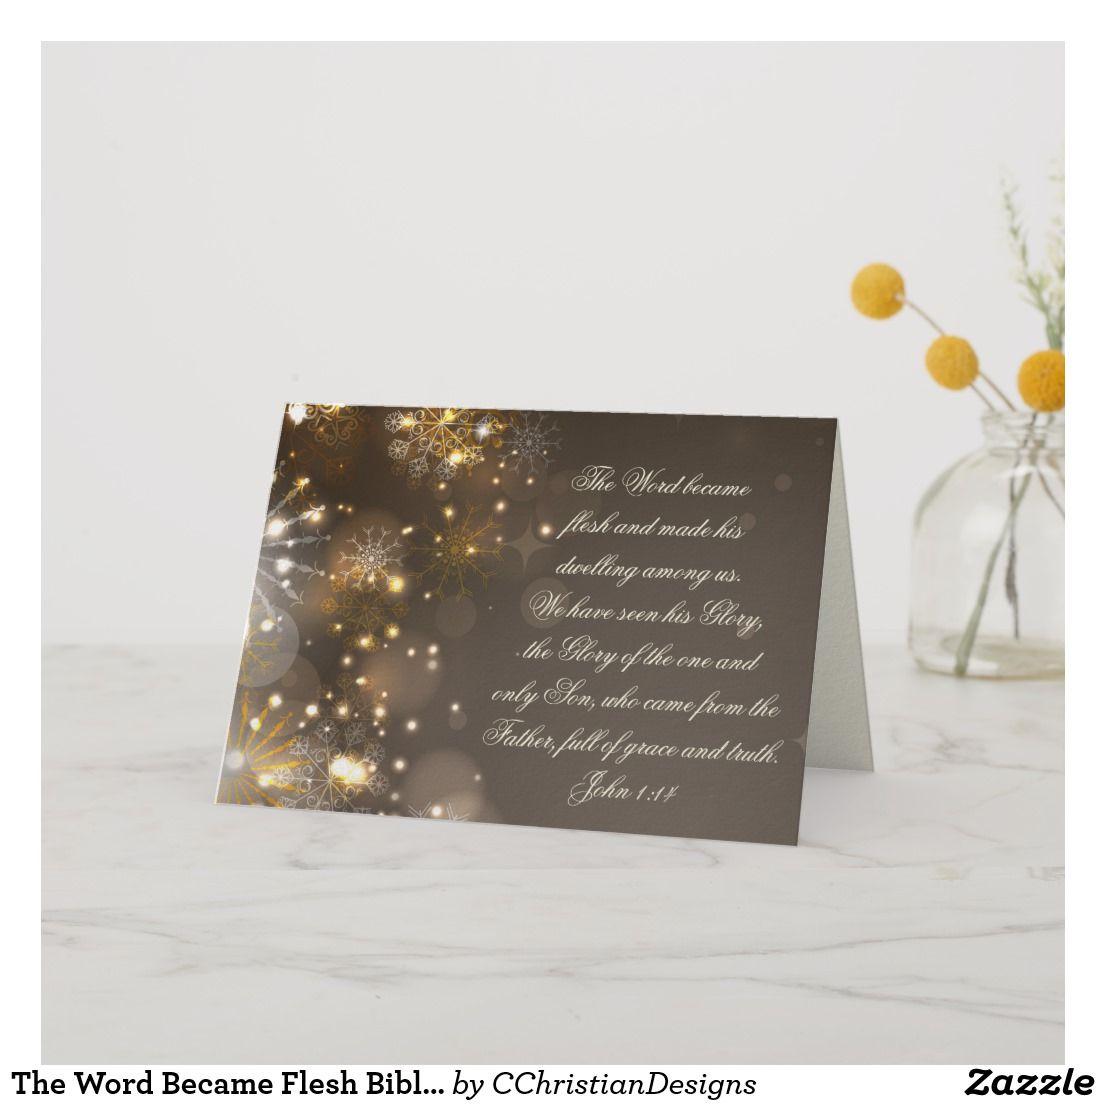 The Word Became Flesh Bible Verse John 1 14 Custom Holiday Card Zazzle Com Custom Holiday Card Holiday Design Card Custom Christmas Cards